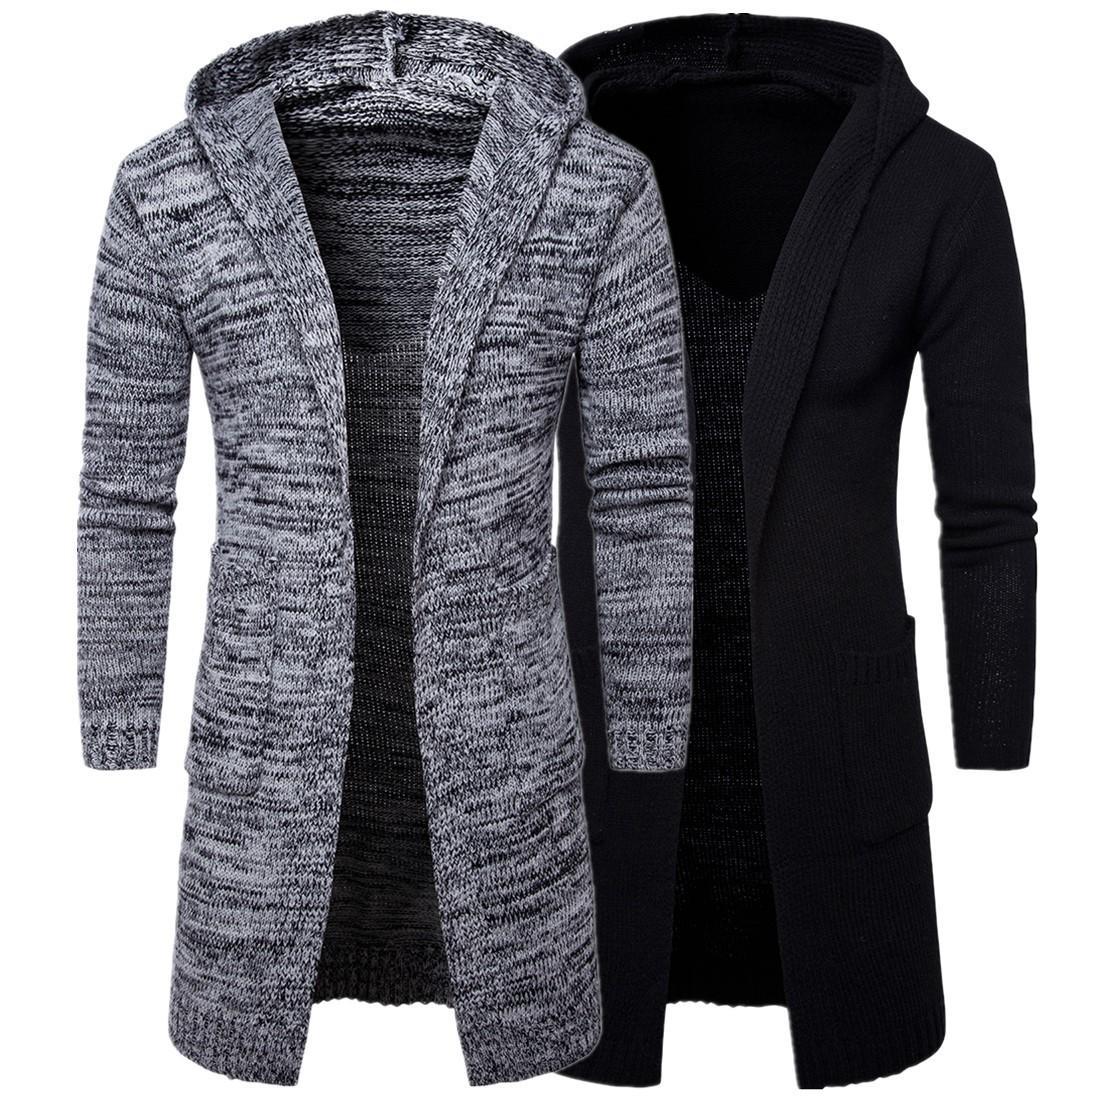 ff3f138dfb0b 2019 AmberHeard Fashion Men Hooded Sweatshirts Hip Hop Mantle Hoodies  Jacket Long Sleeve Cloak Male Coat Outwear Moleton Masculino From  Qingchunstore, ...